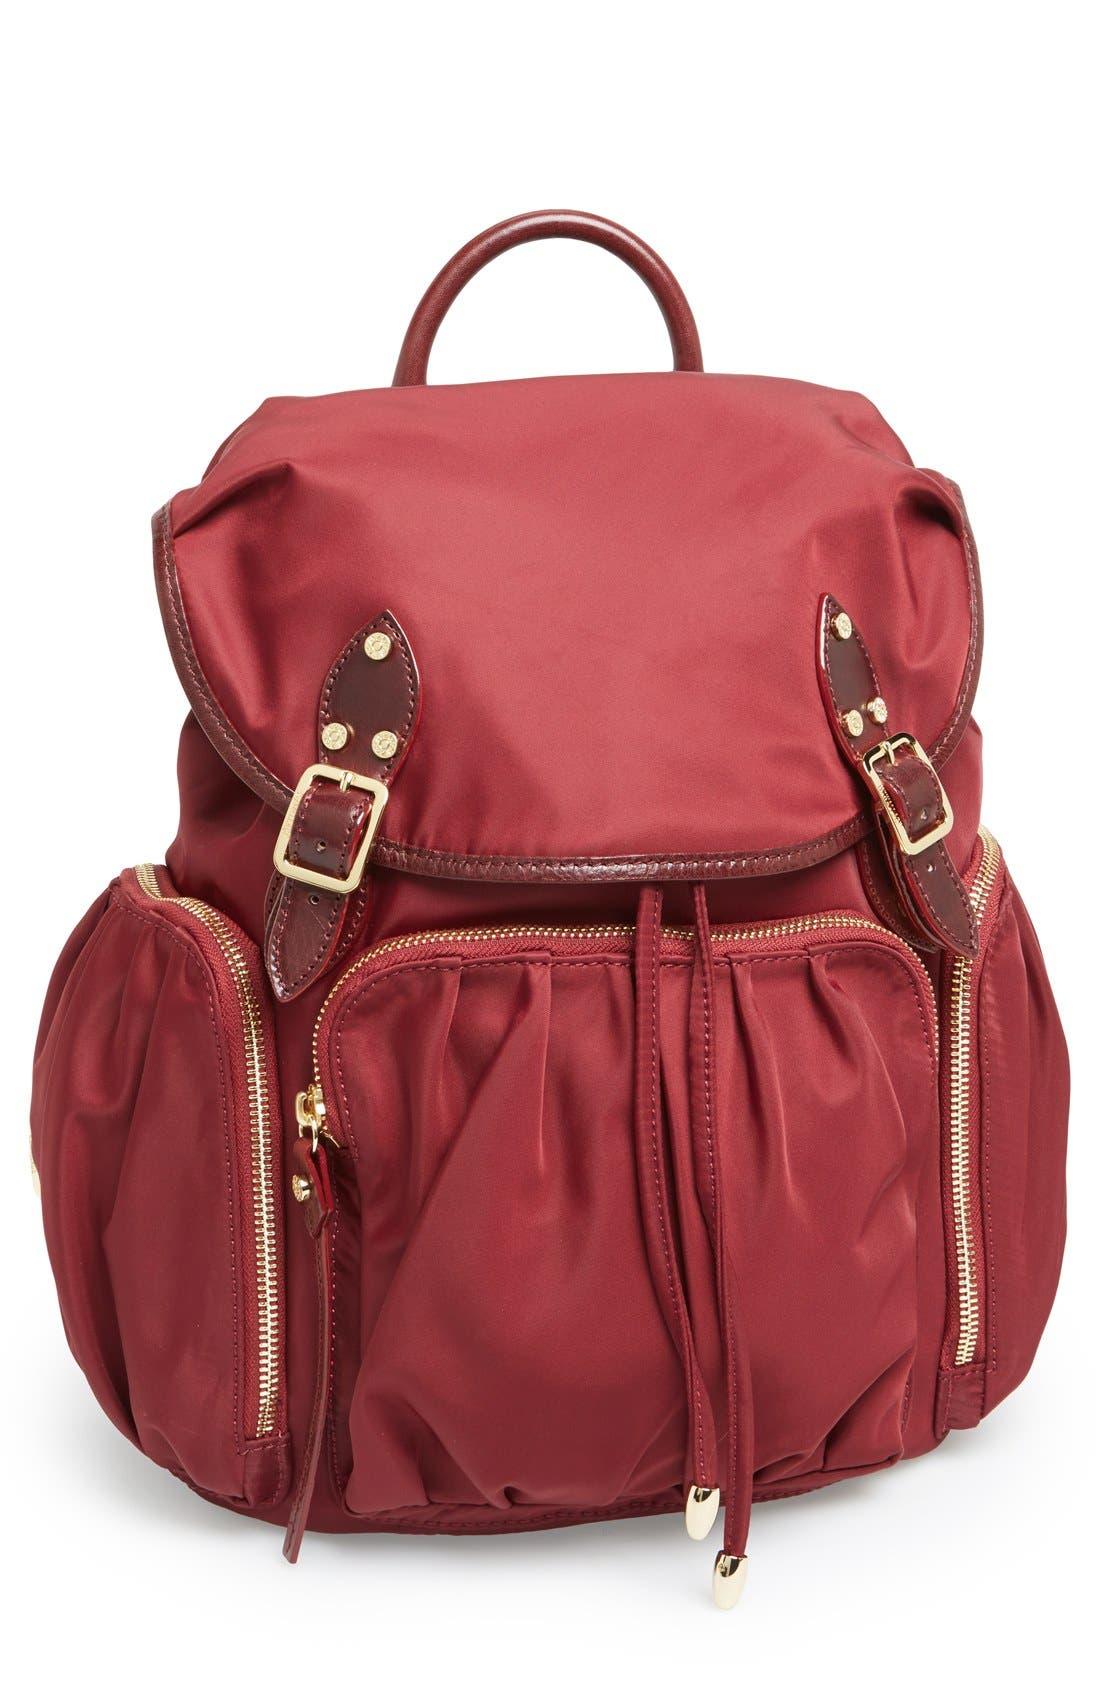 Alternate Image 1 Selected - MZ Wallace 'Marlena' Nylon Backpack